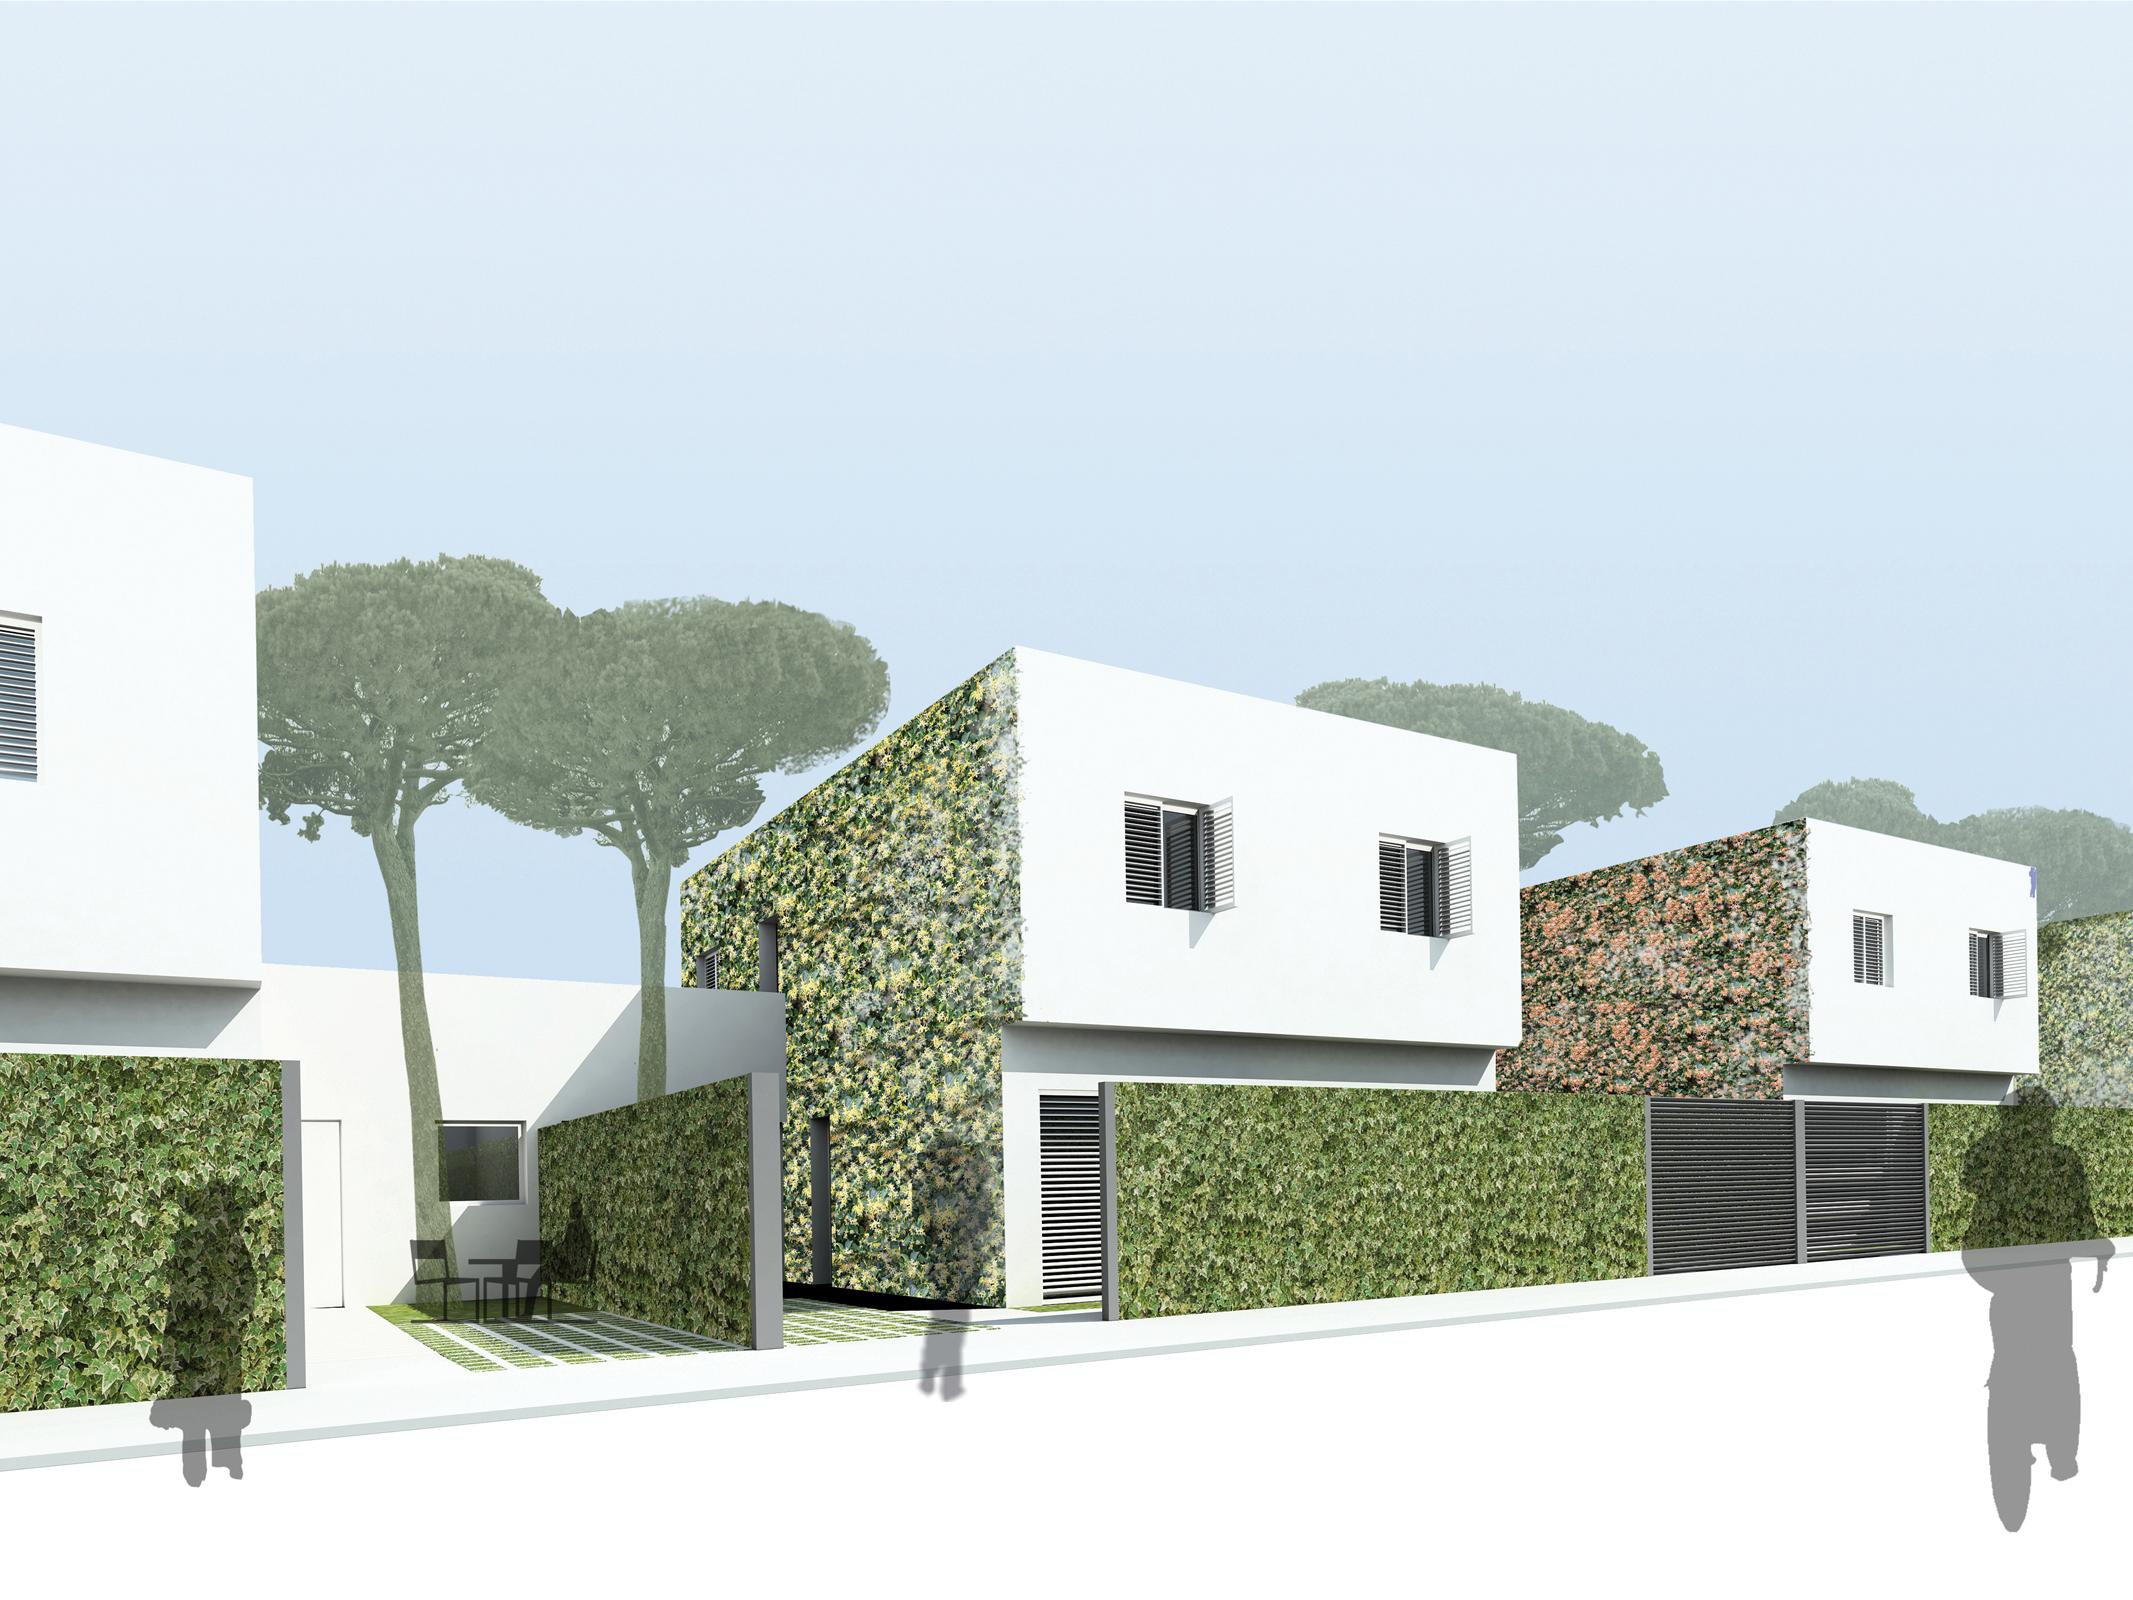 Vivienda social c rdoba roa arquitectura for Vivienda arquitectura